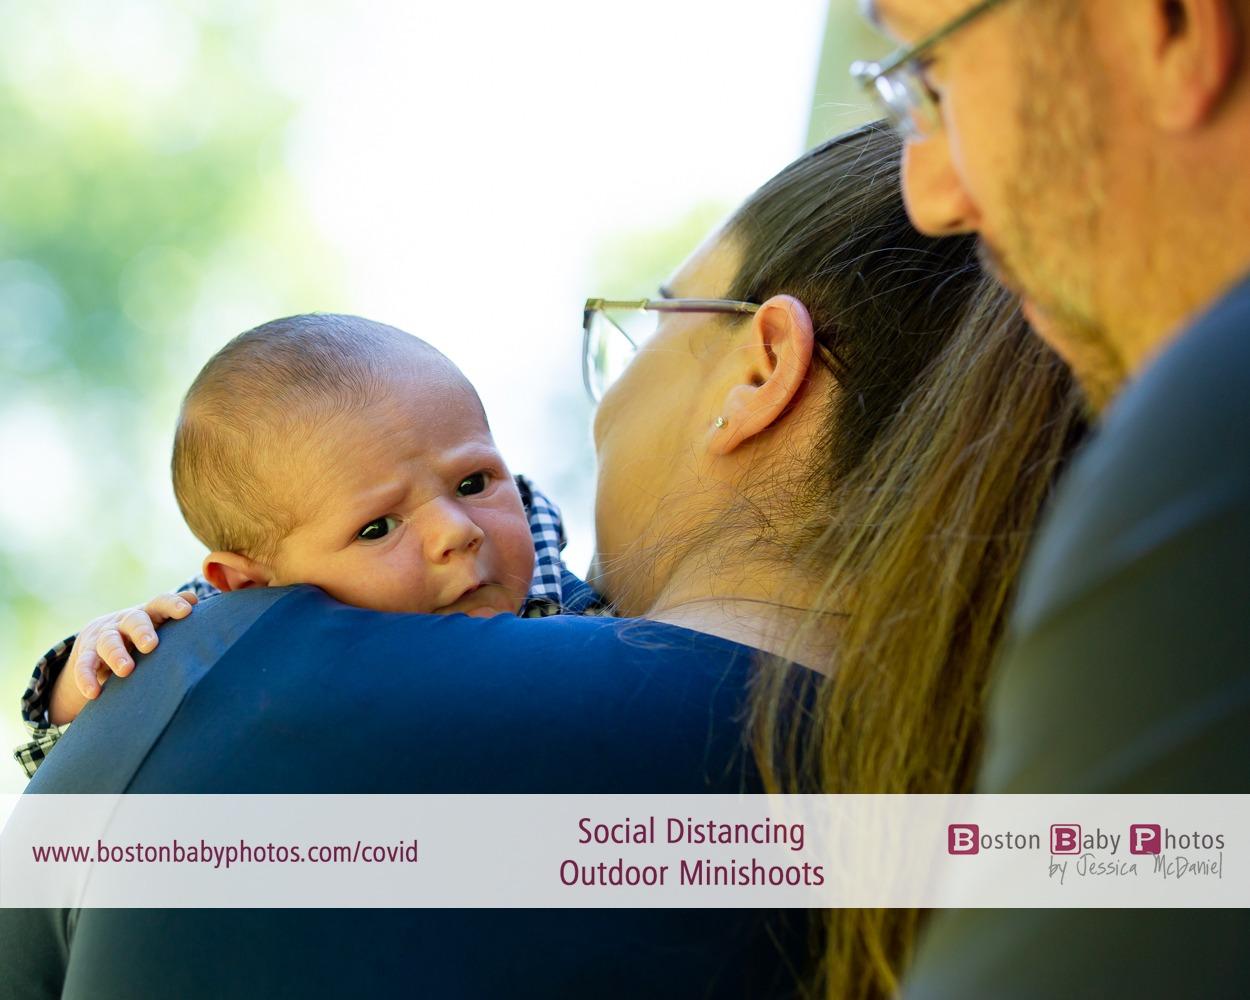 Bridgewater, MA: Social Distancing Newborn Outdoor Minishoot